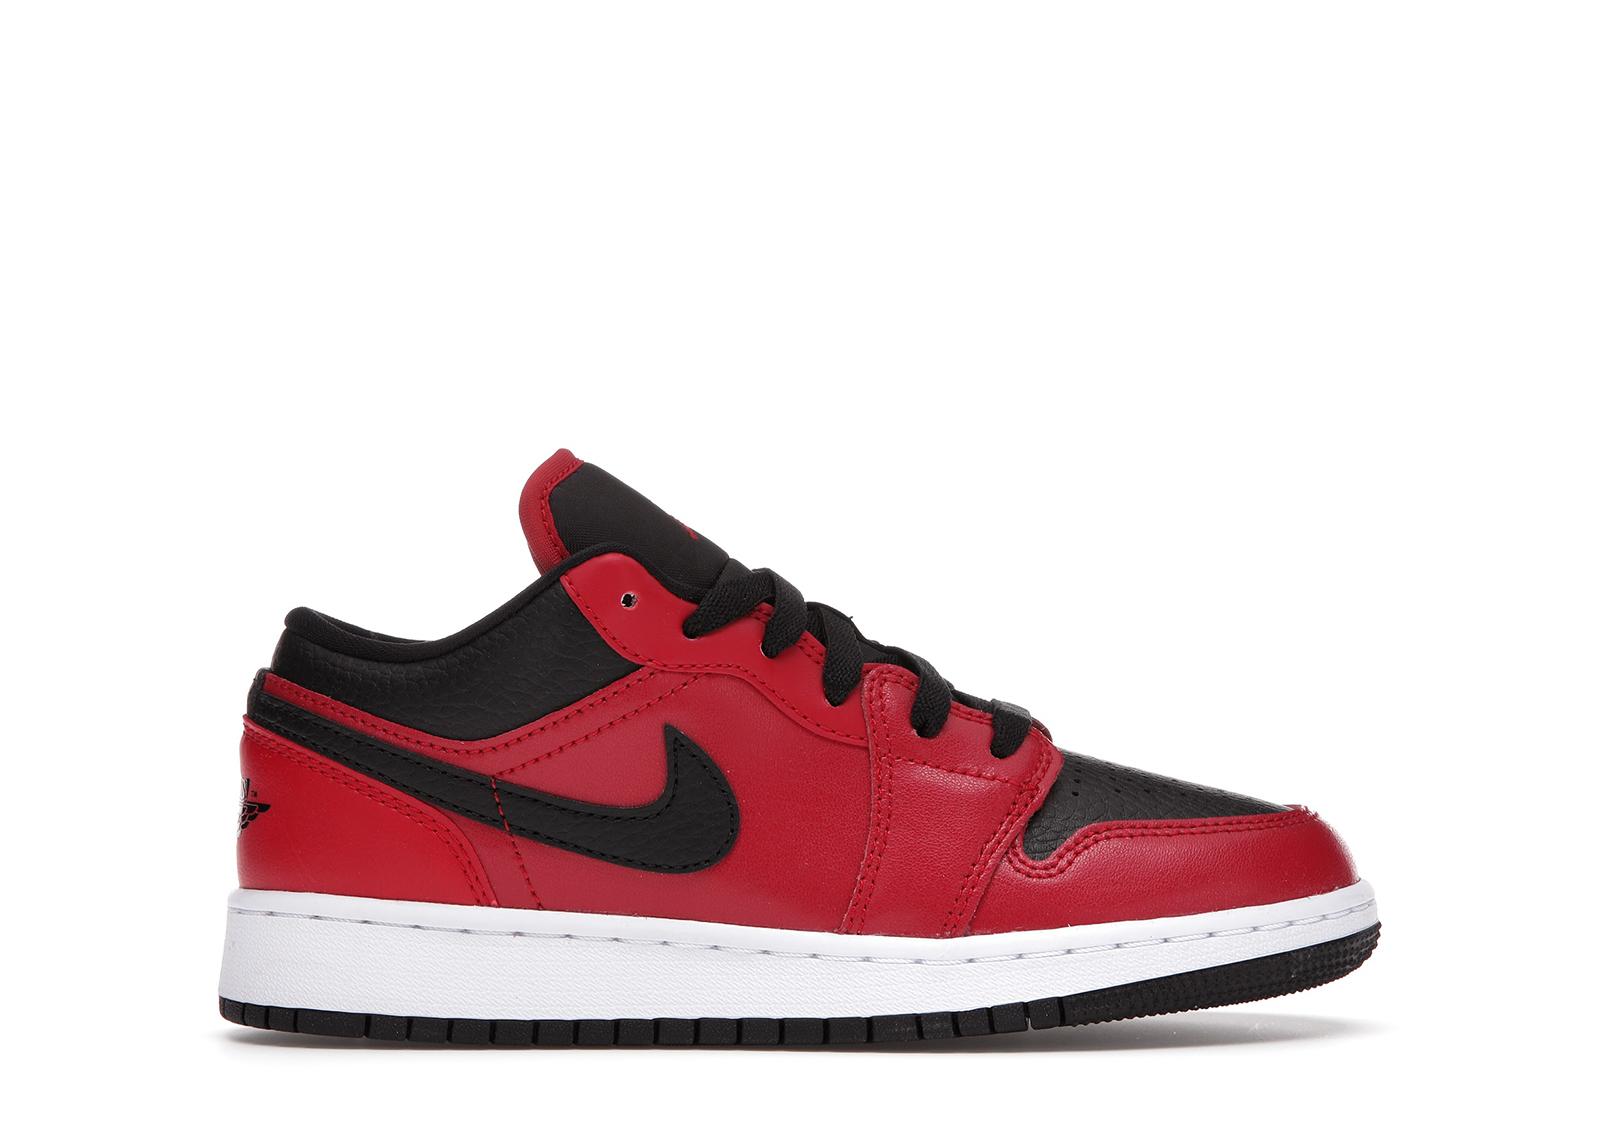 Jordan 1 Low Gym Red Black Pebbled (GS)